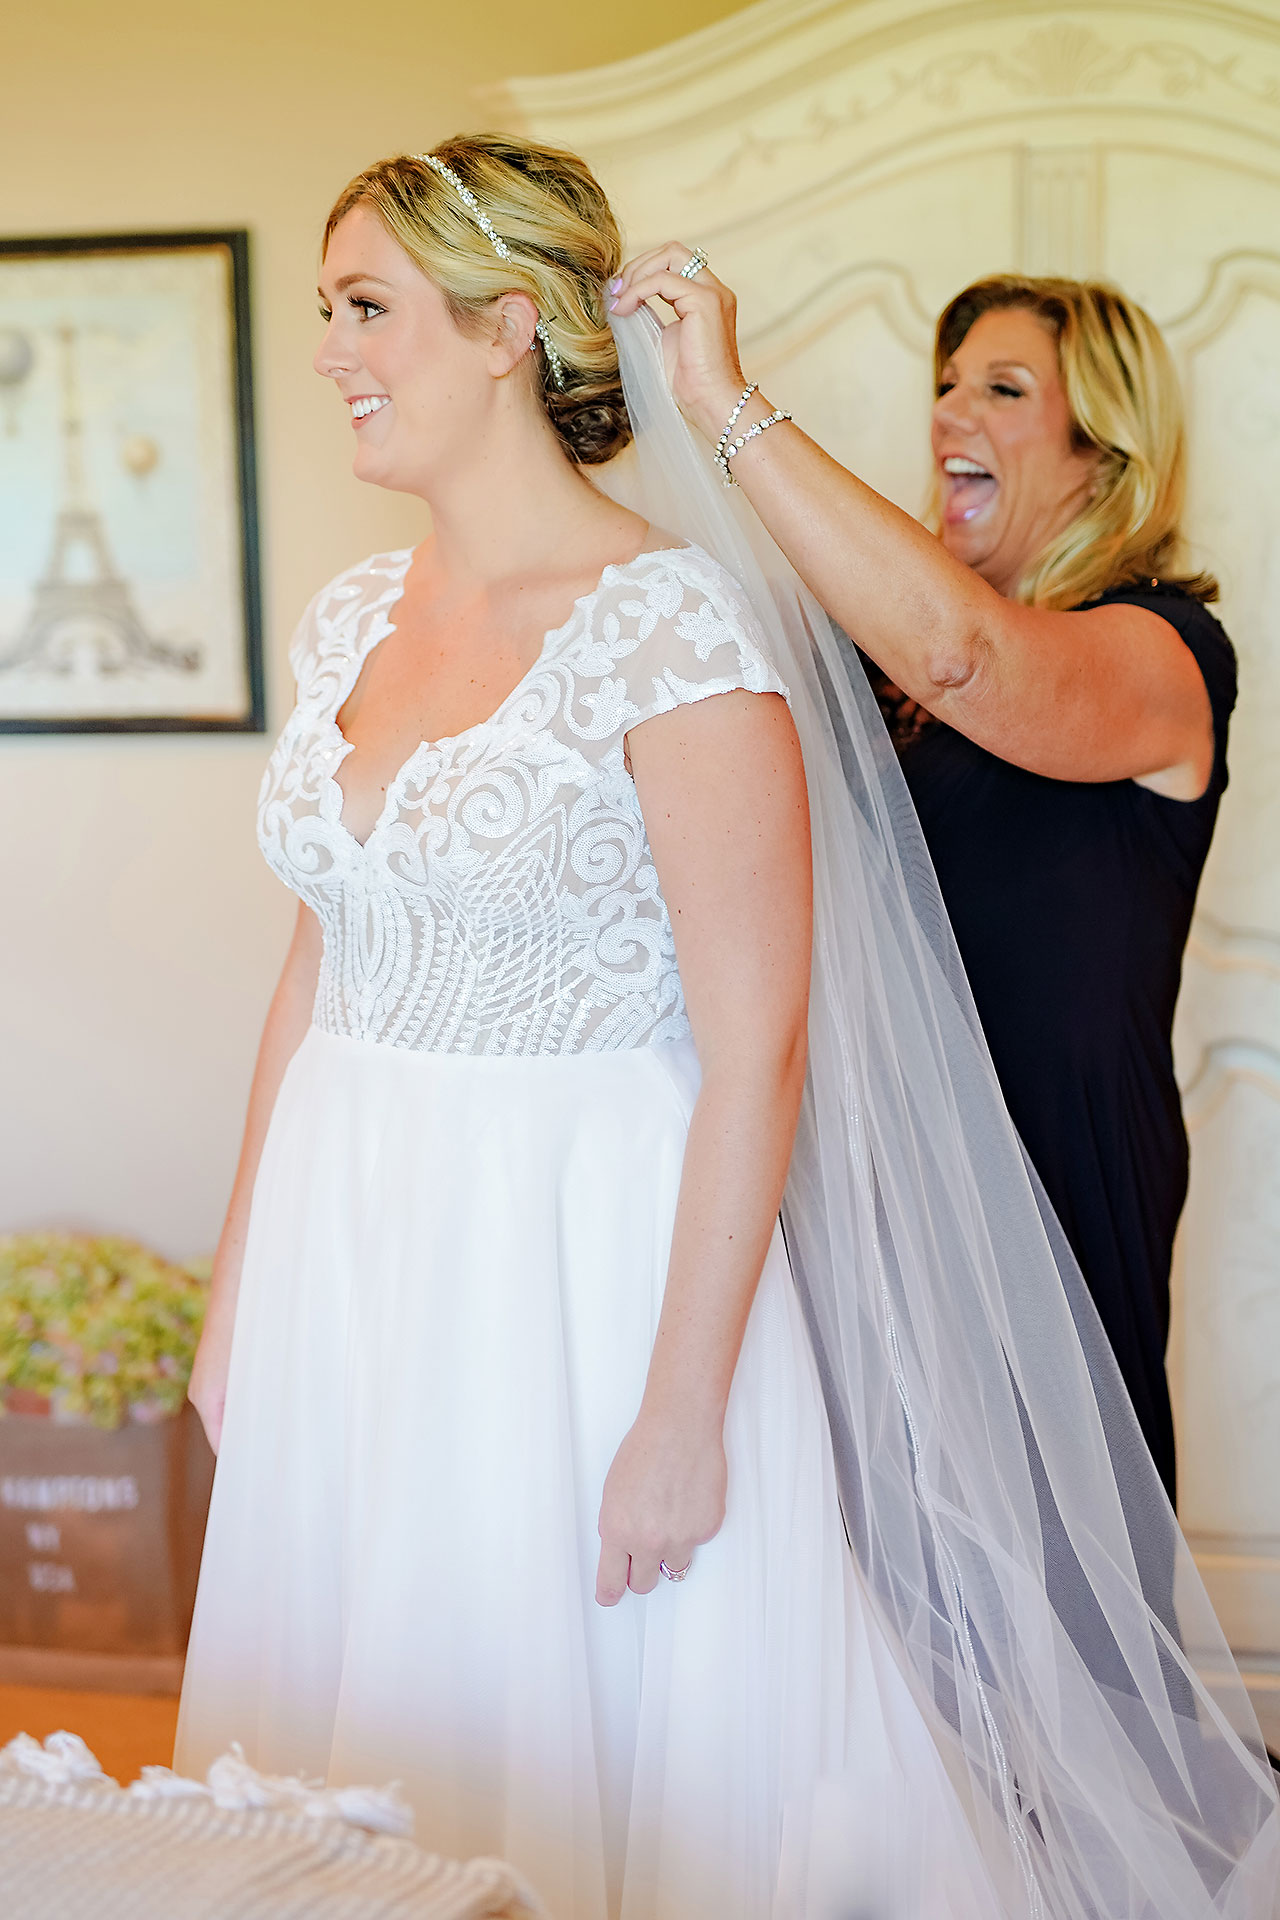 Taylor Case Backyard Carmel Wedding 016